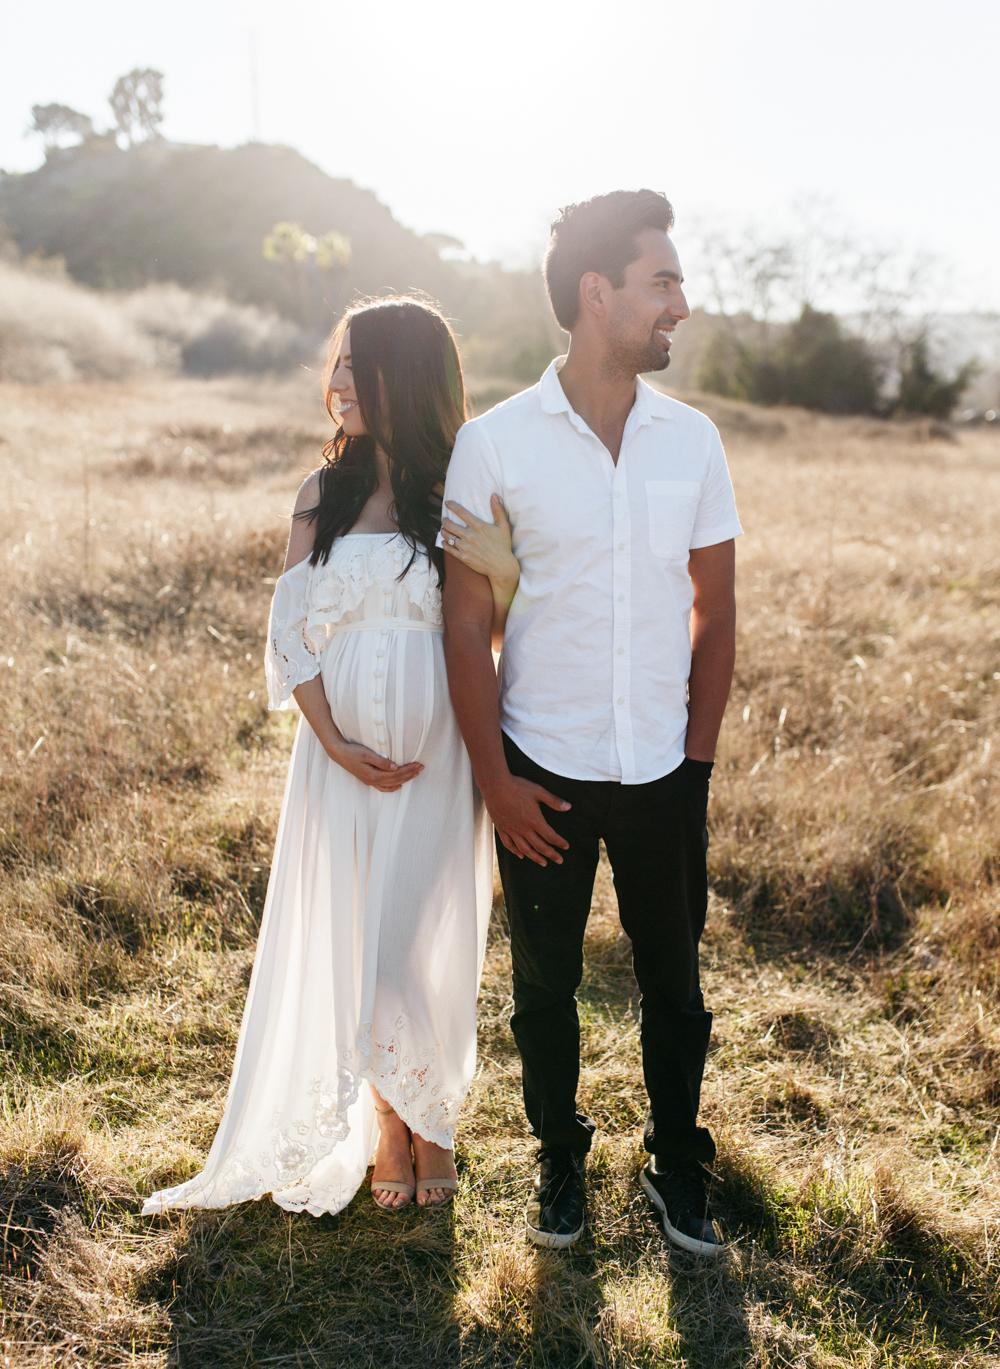 SamErica Studios - San Diego Maternity Session and Gender Reveal-32.jpg